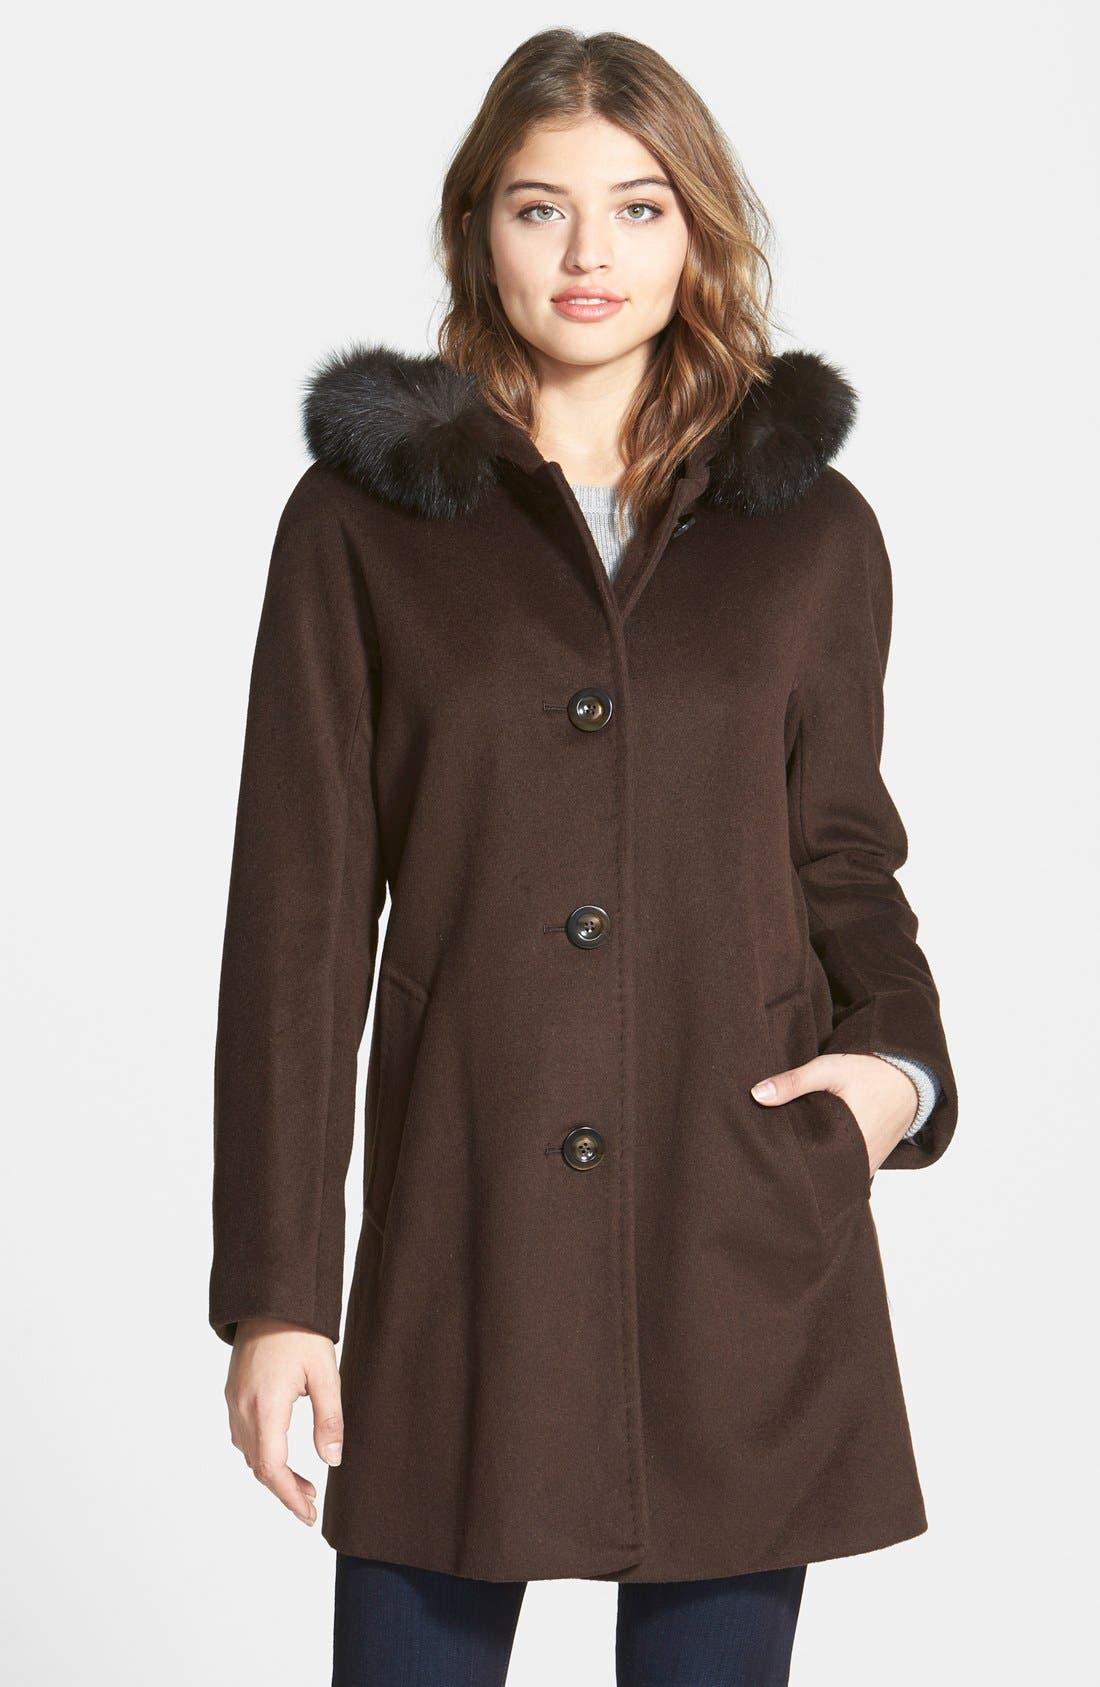 Alternate Image 1 Selected - Ellen Tracy Kimono Sleeve Jacket with Genuine Fox Fur Trim (Online Only)